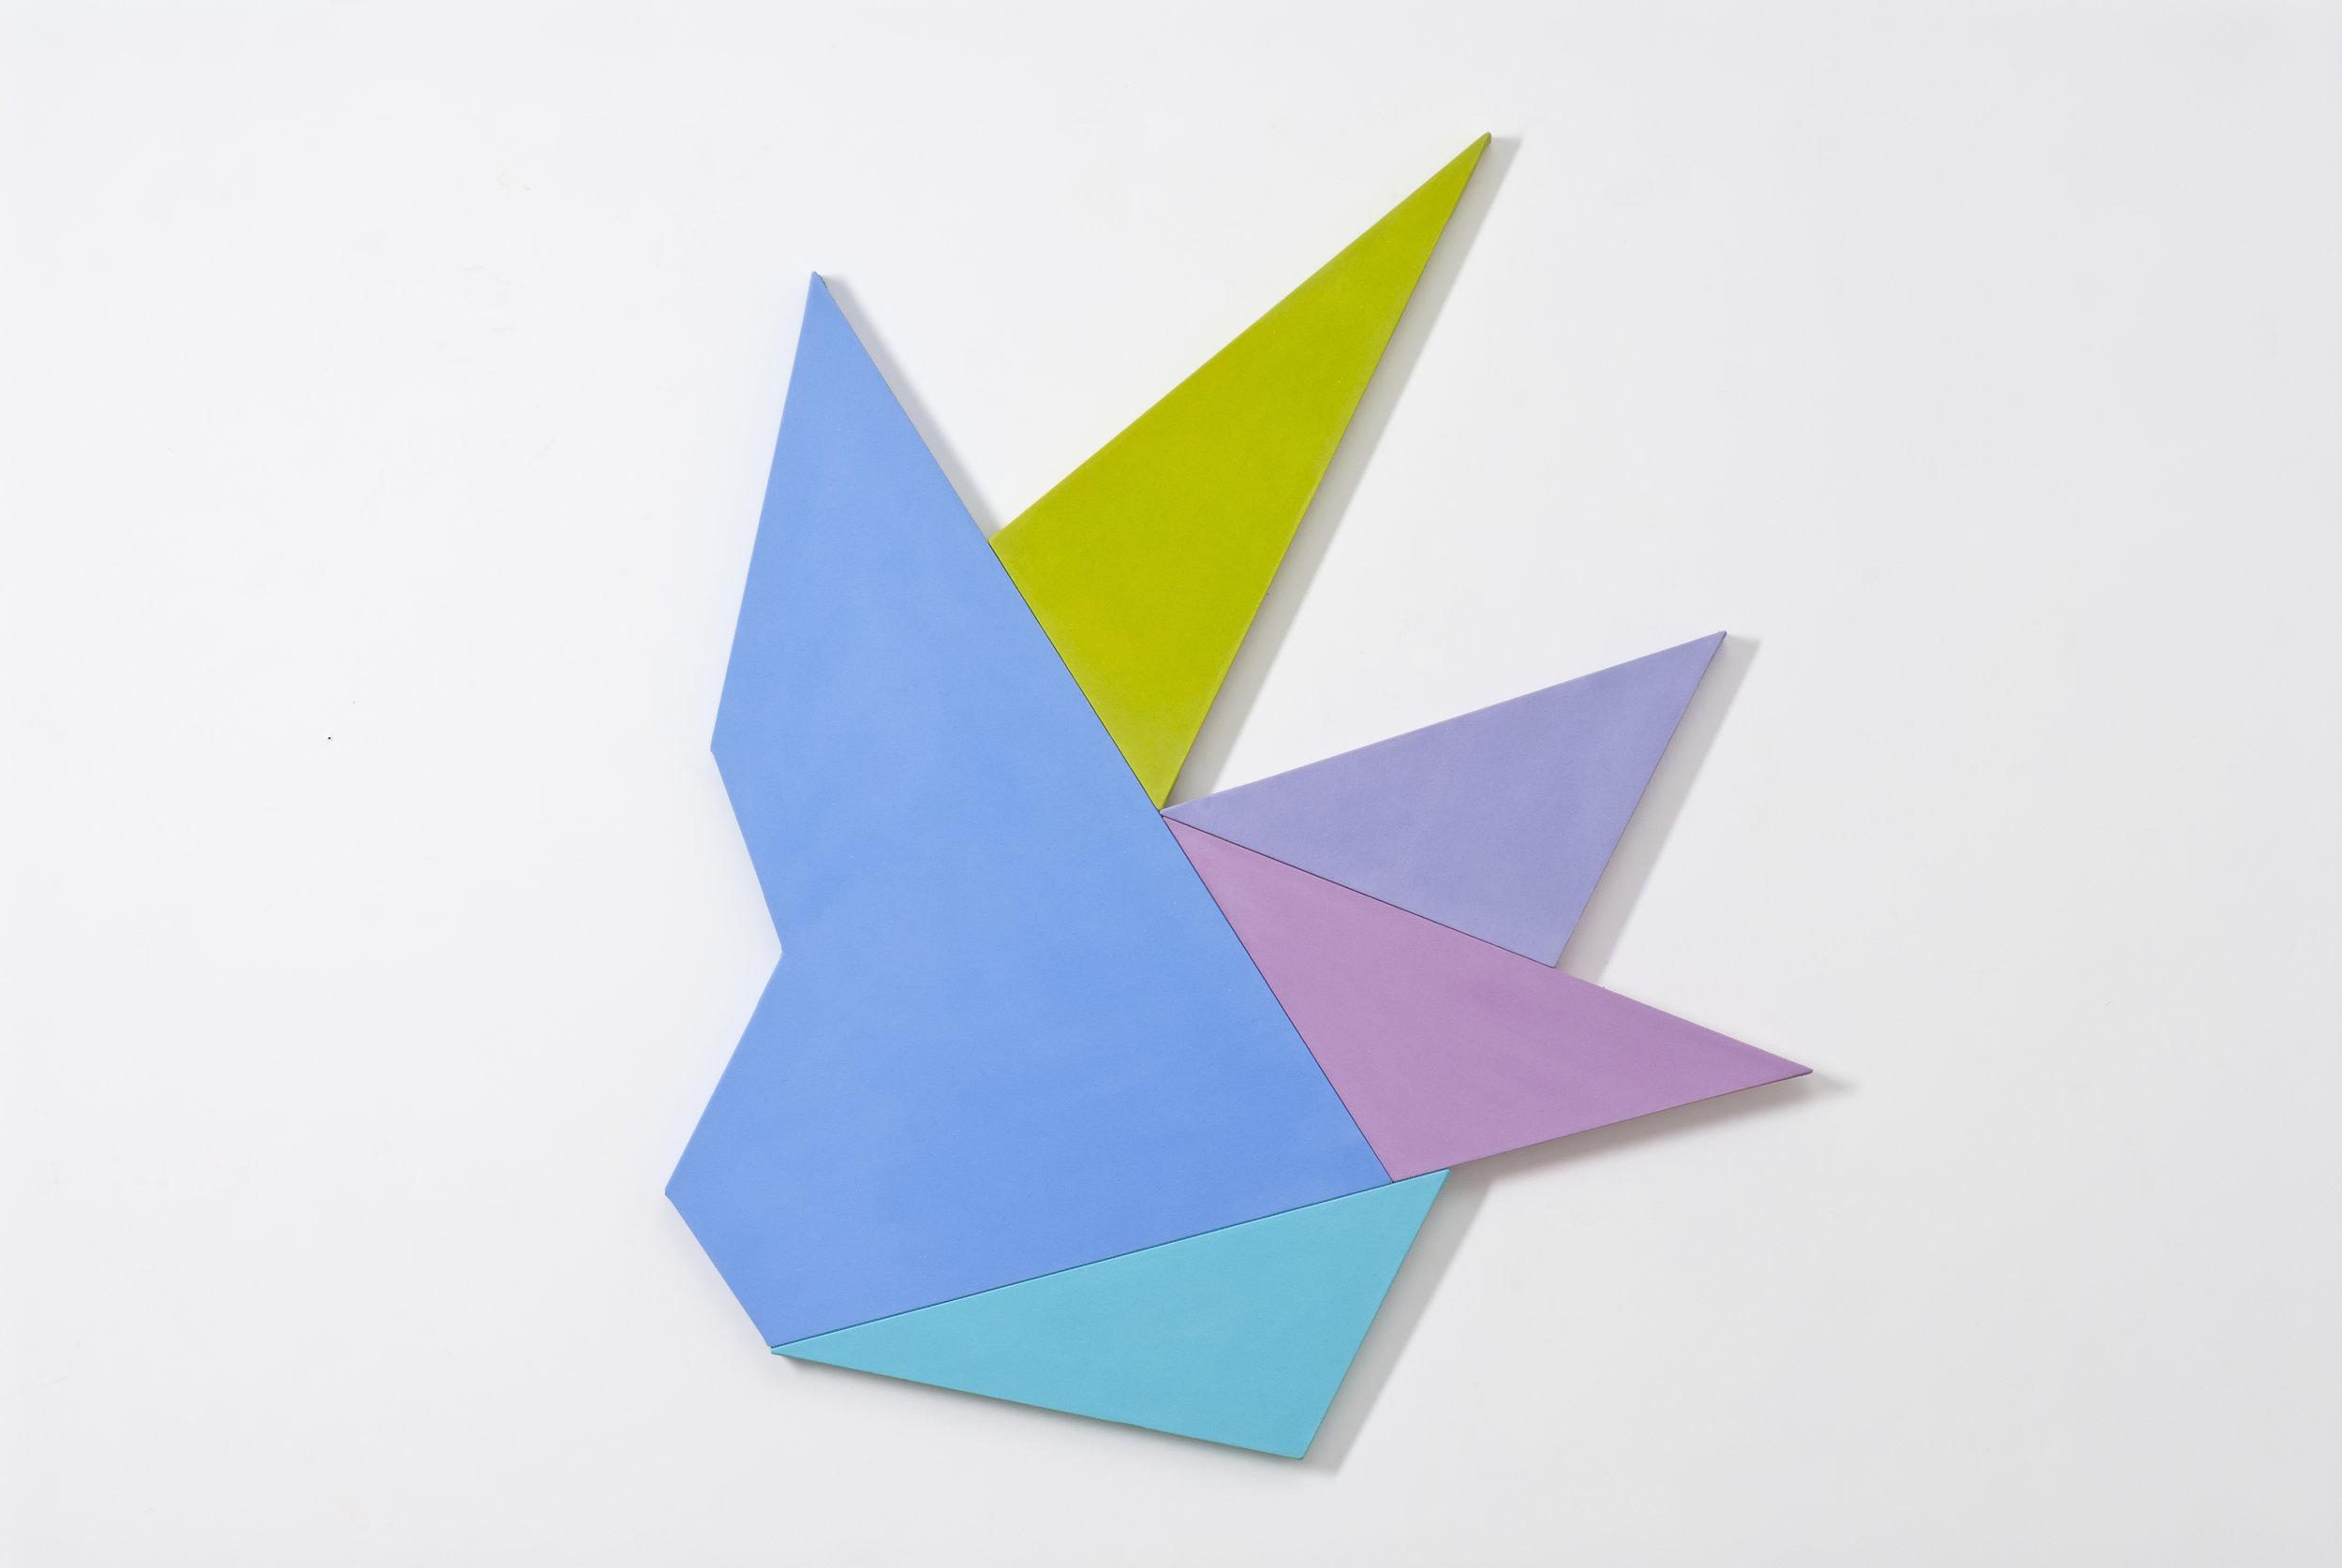 Infinex #43 , 2014, acrylic on canvas, 113 x 118.5 cm.